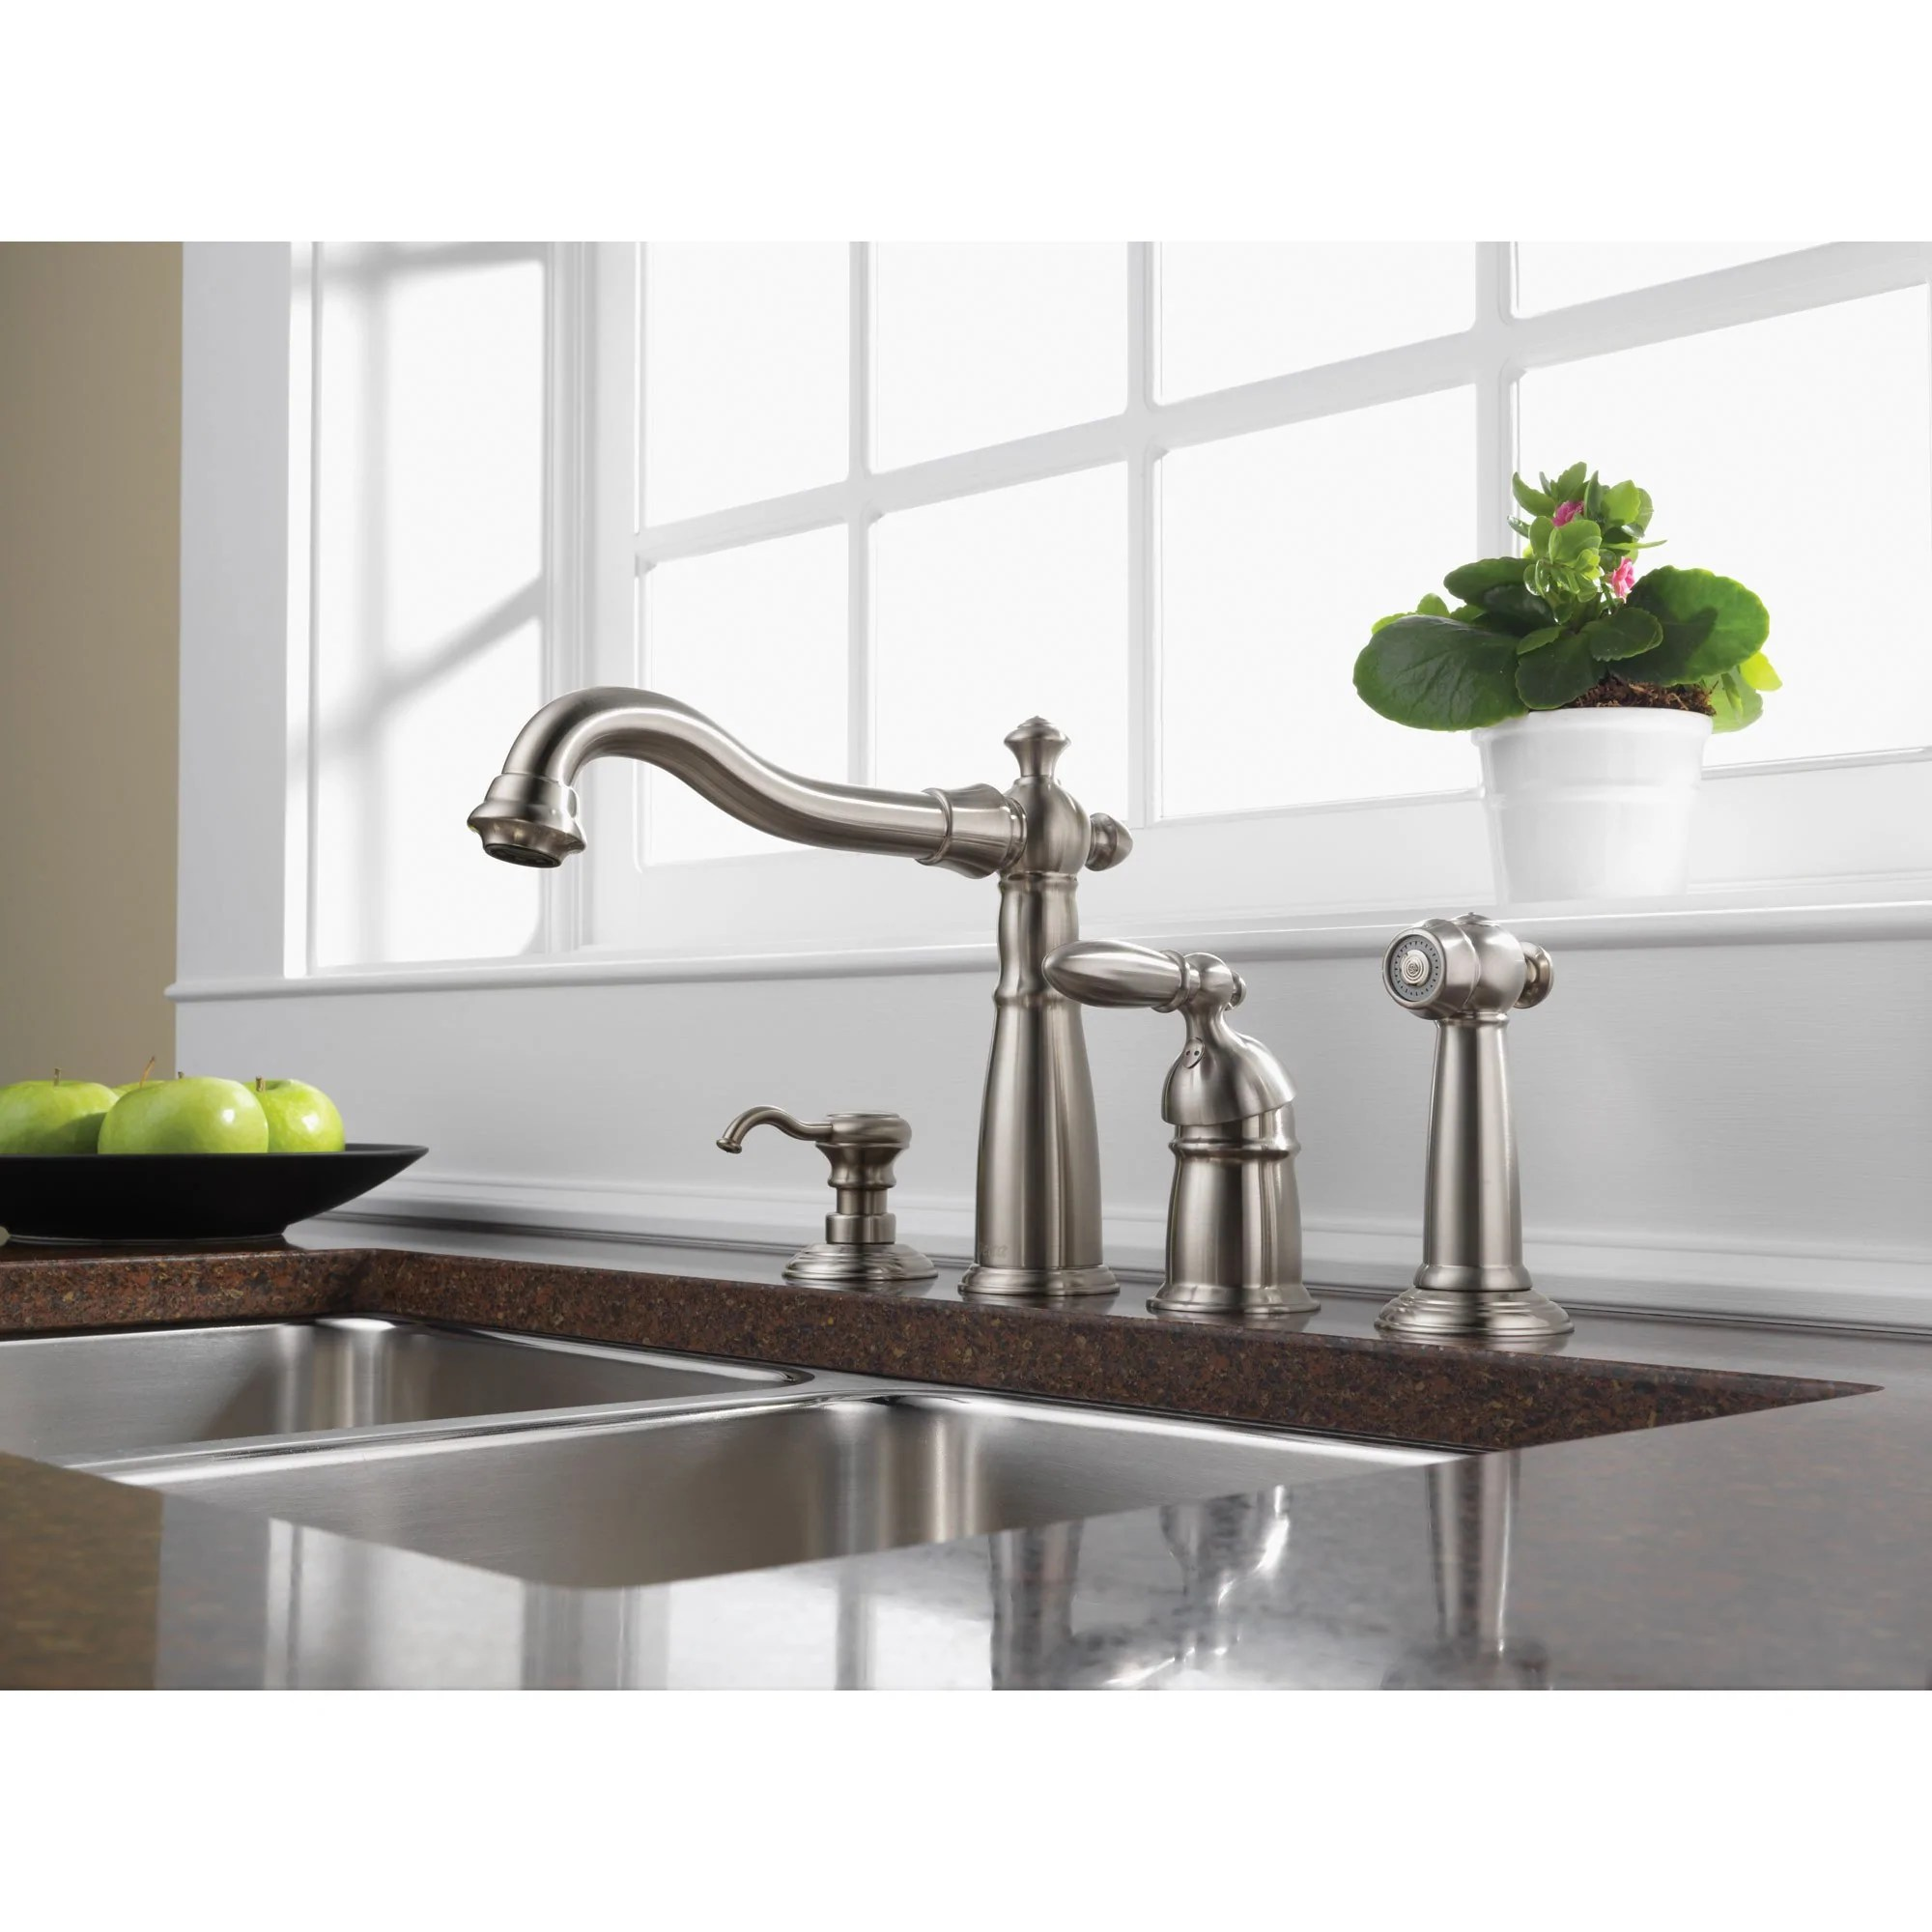 stainless steel kitchen faucets porcelain undermount sink delta victorian collection single handle fauce faucetlist com